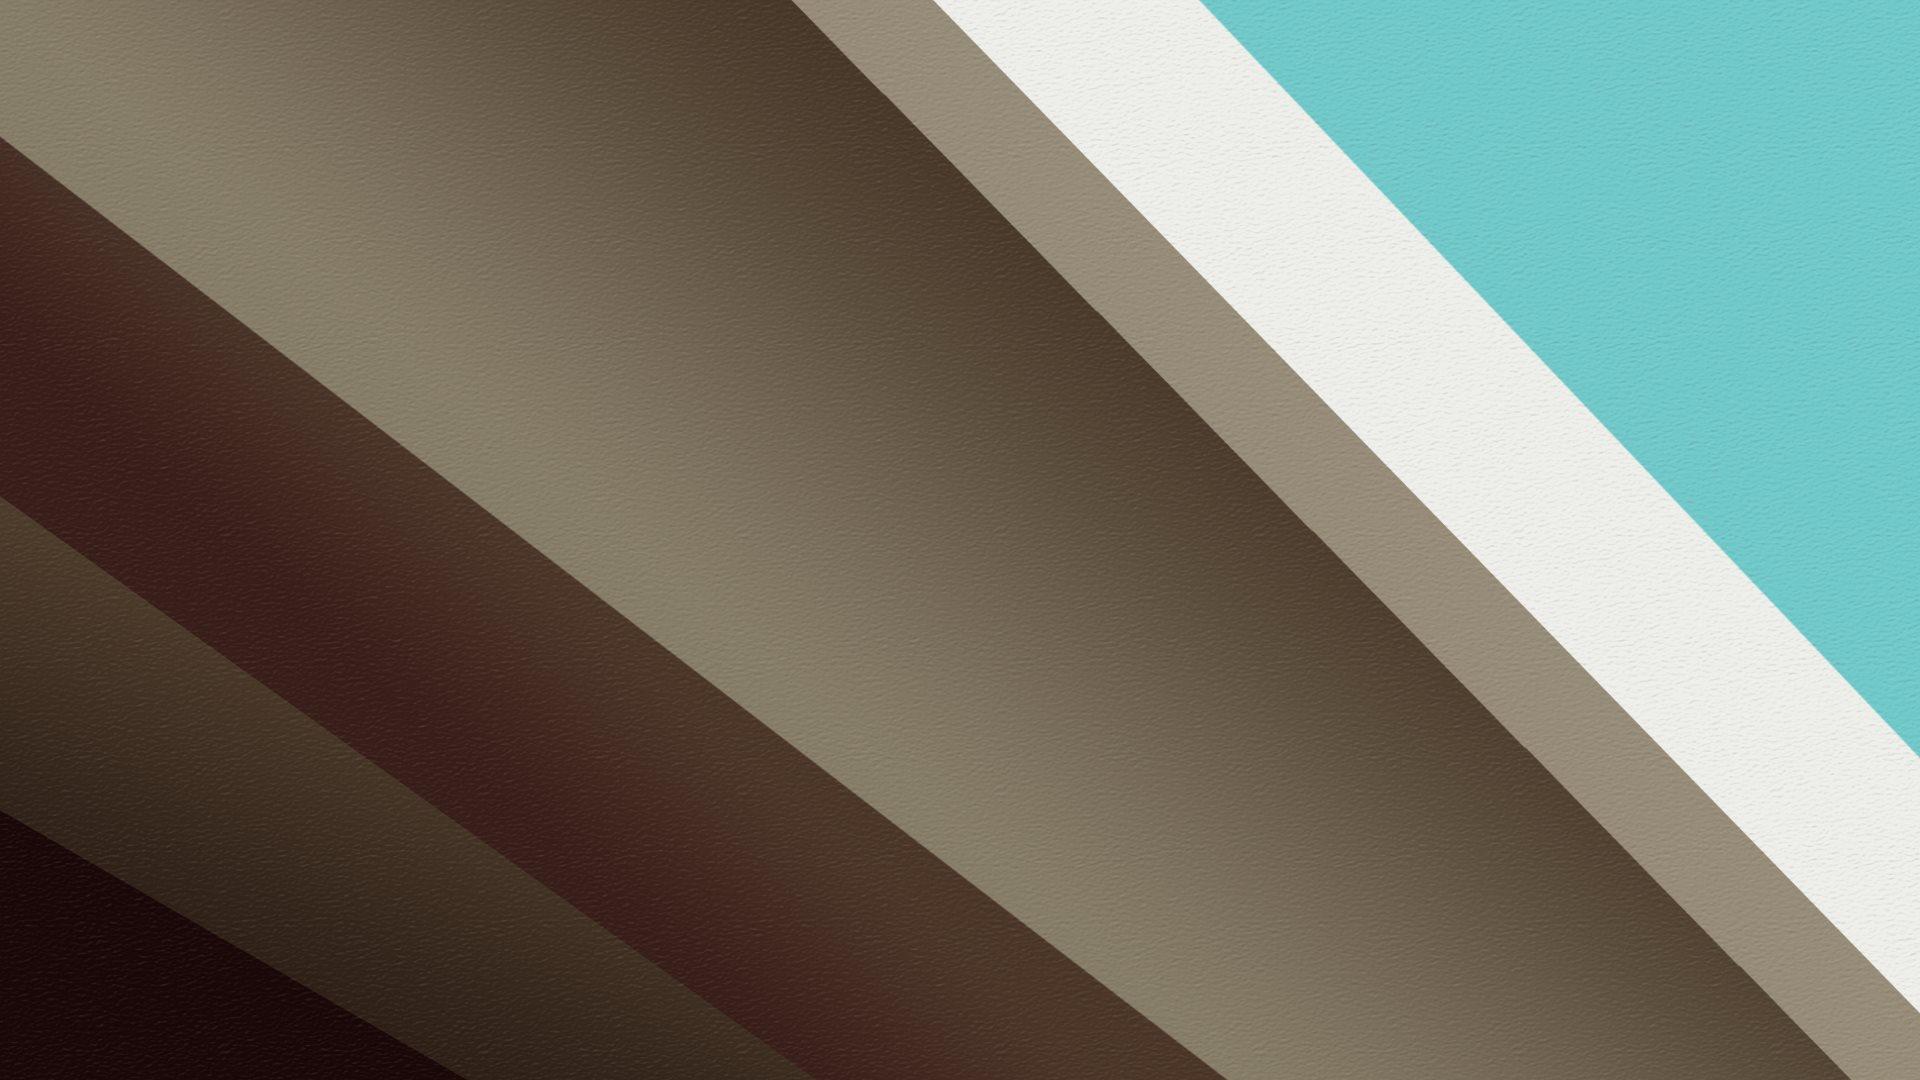 hd wallpaper android l